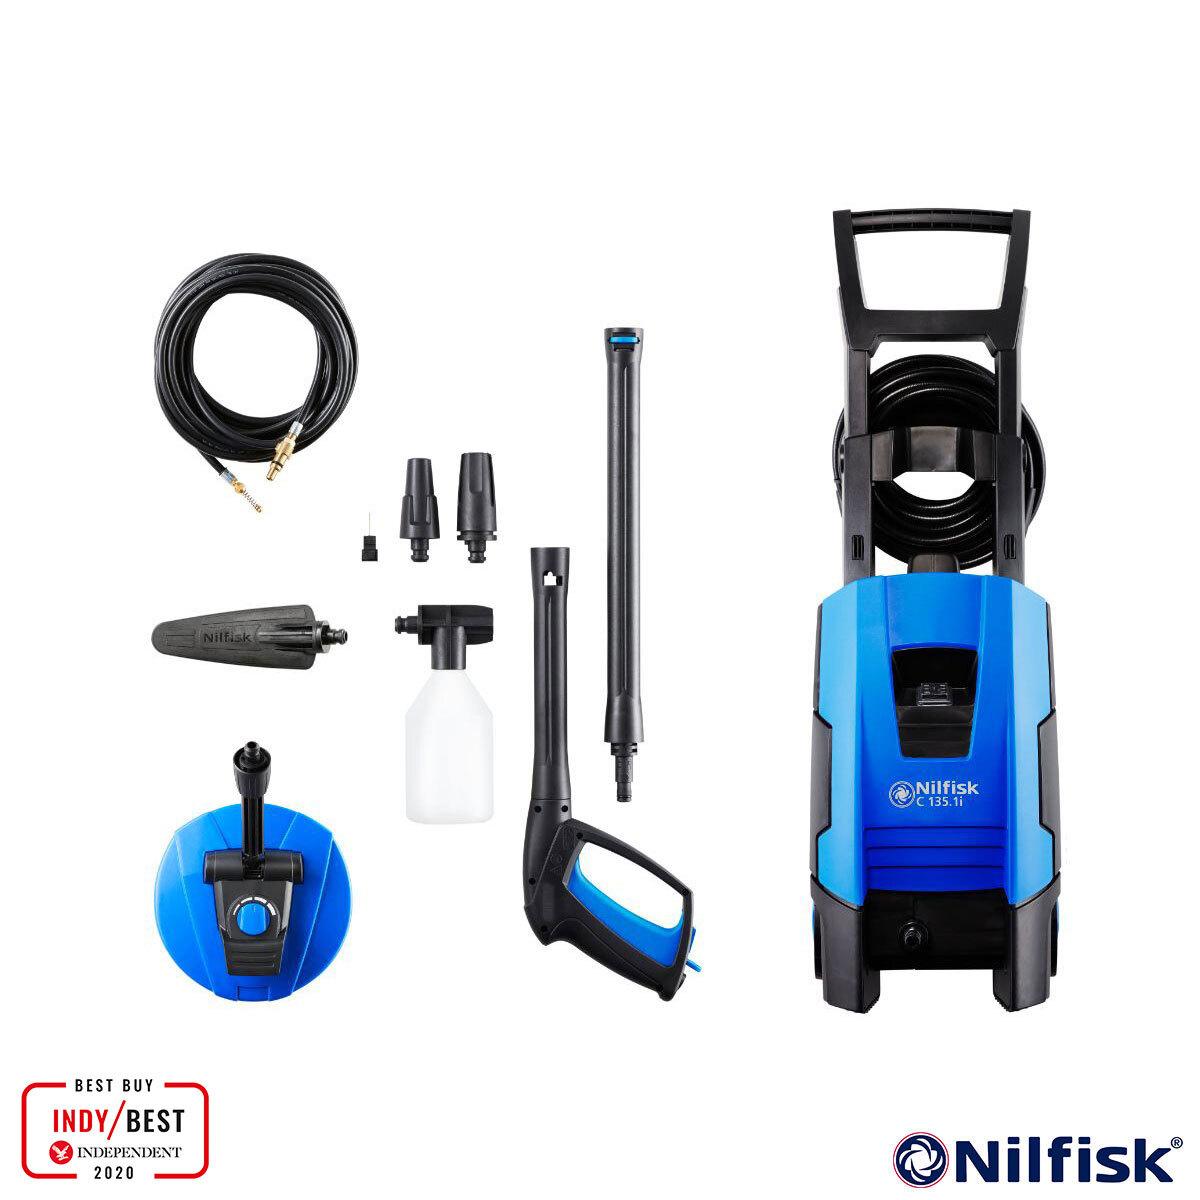 nilfisk c135 1 8i maintenance pressure washer costco uk